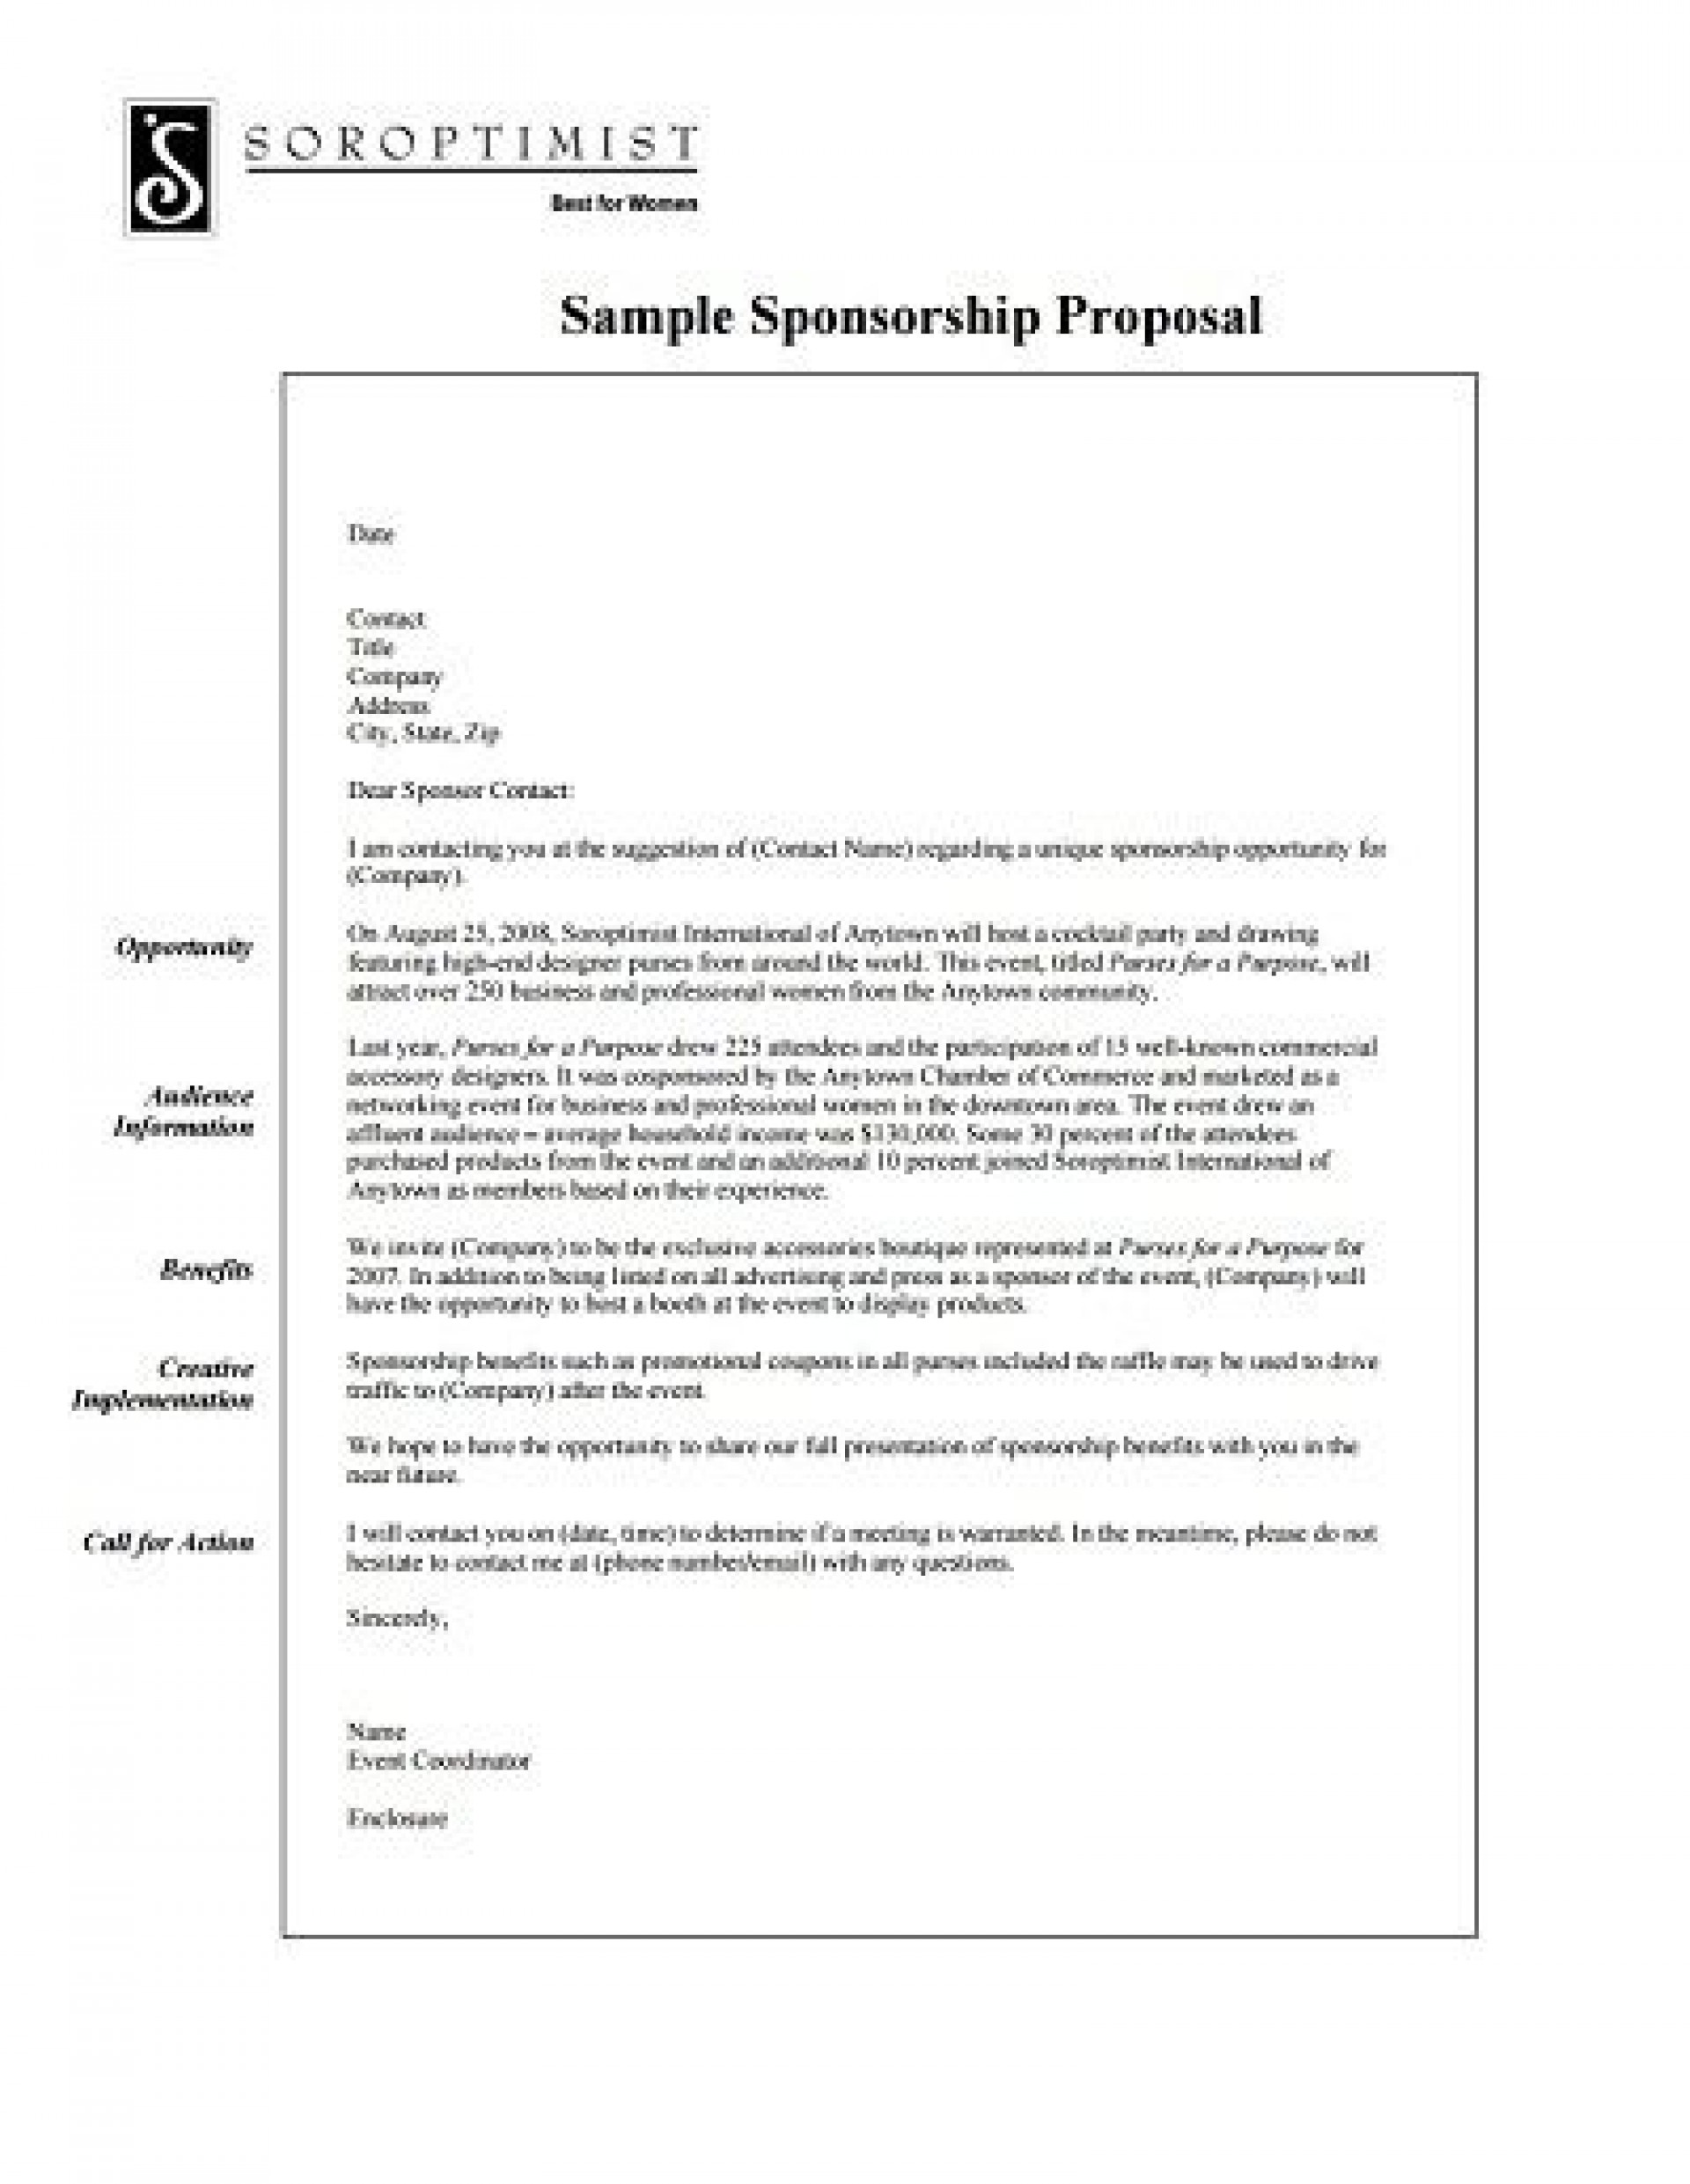 007 Rare Event Sponsorship Proposal Template High Resolution  Free Ppt Music Pdf1920